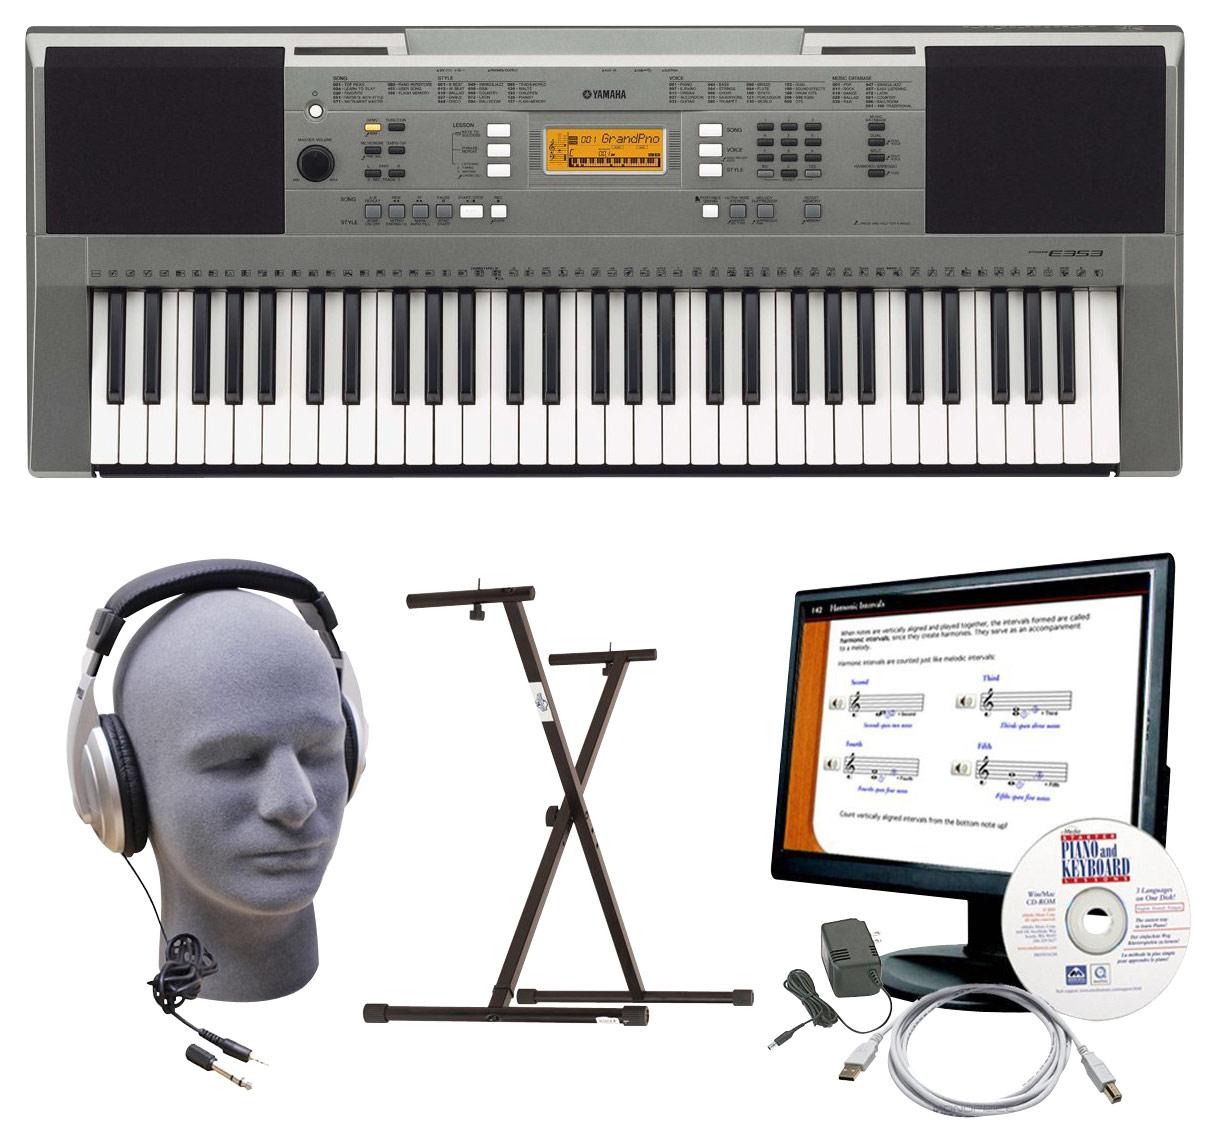 Yamaha - Portable Keyboard with 61 Full-Size Touch-Sensitive Keys - Gray